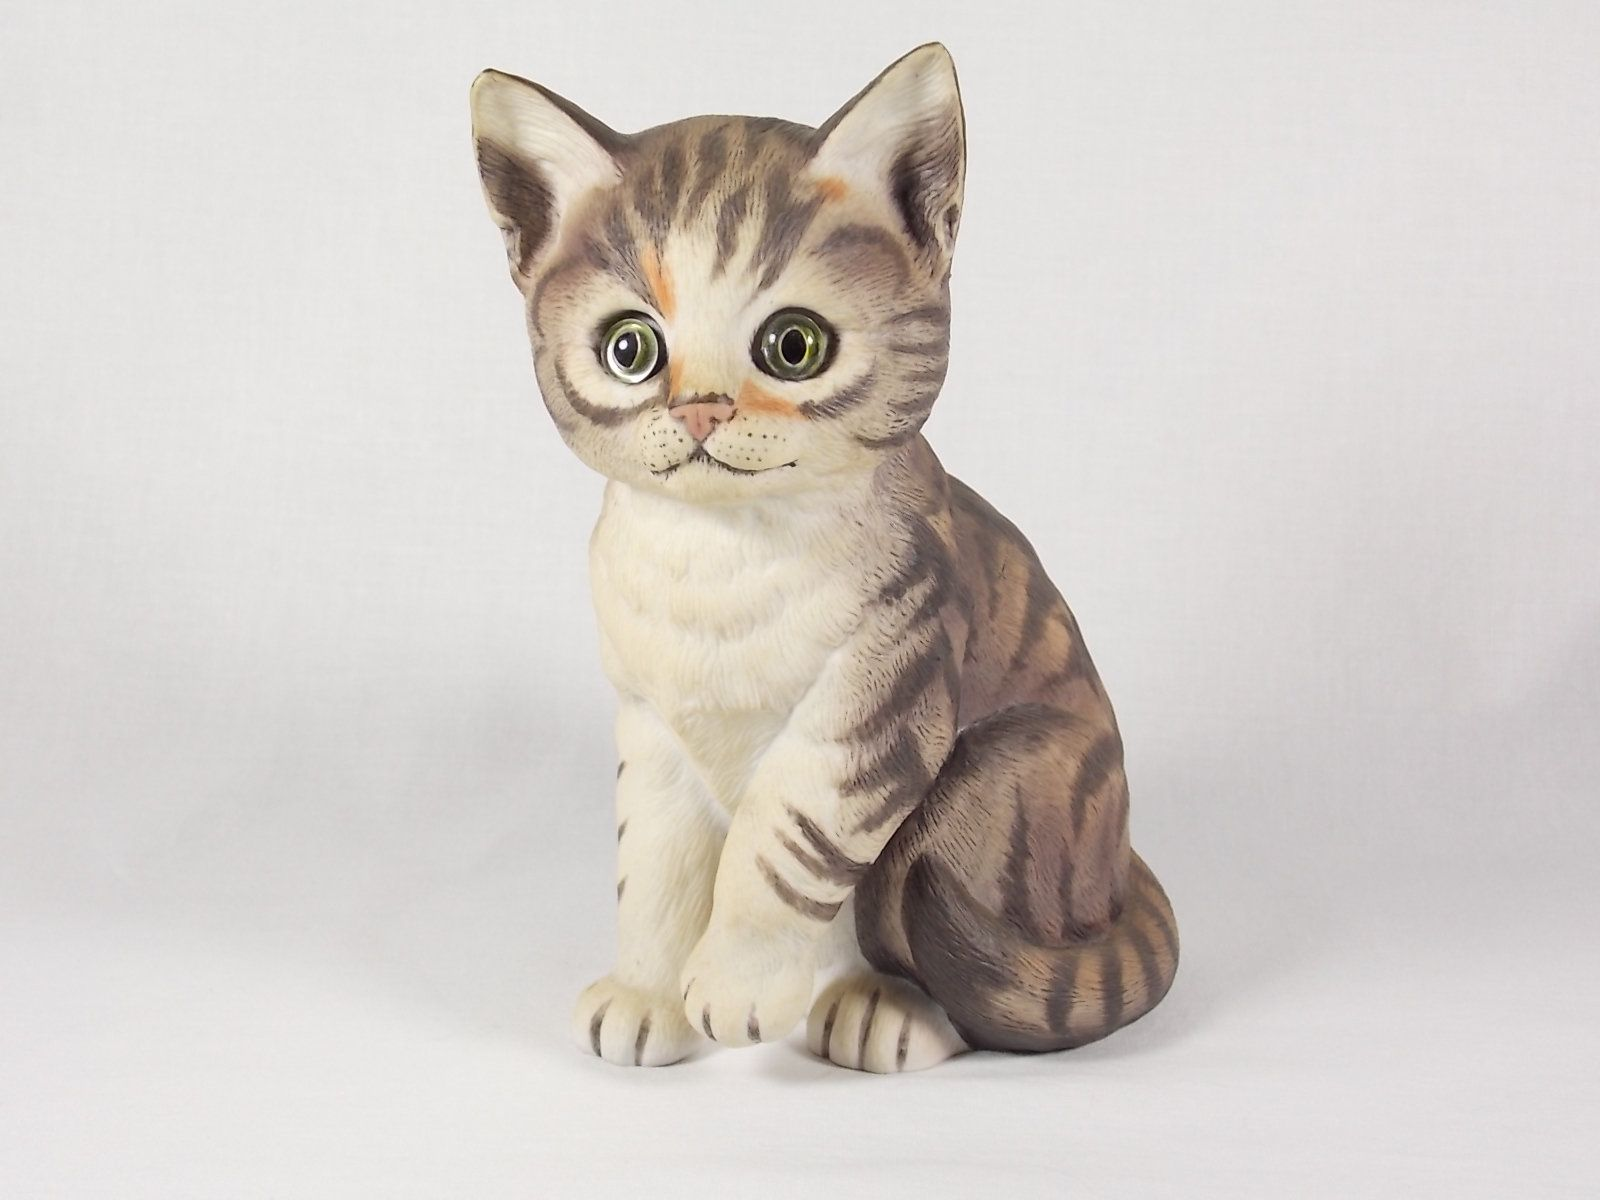 Avon Gotta Getta a Gund My Name Is Tabby The Cat Medium Plush Stuffed Animal